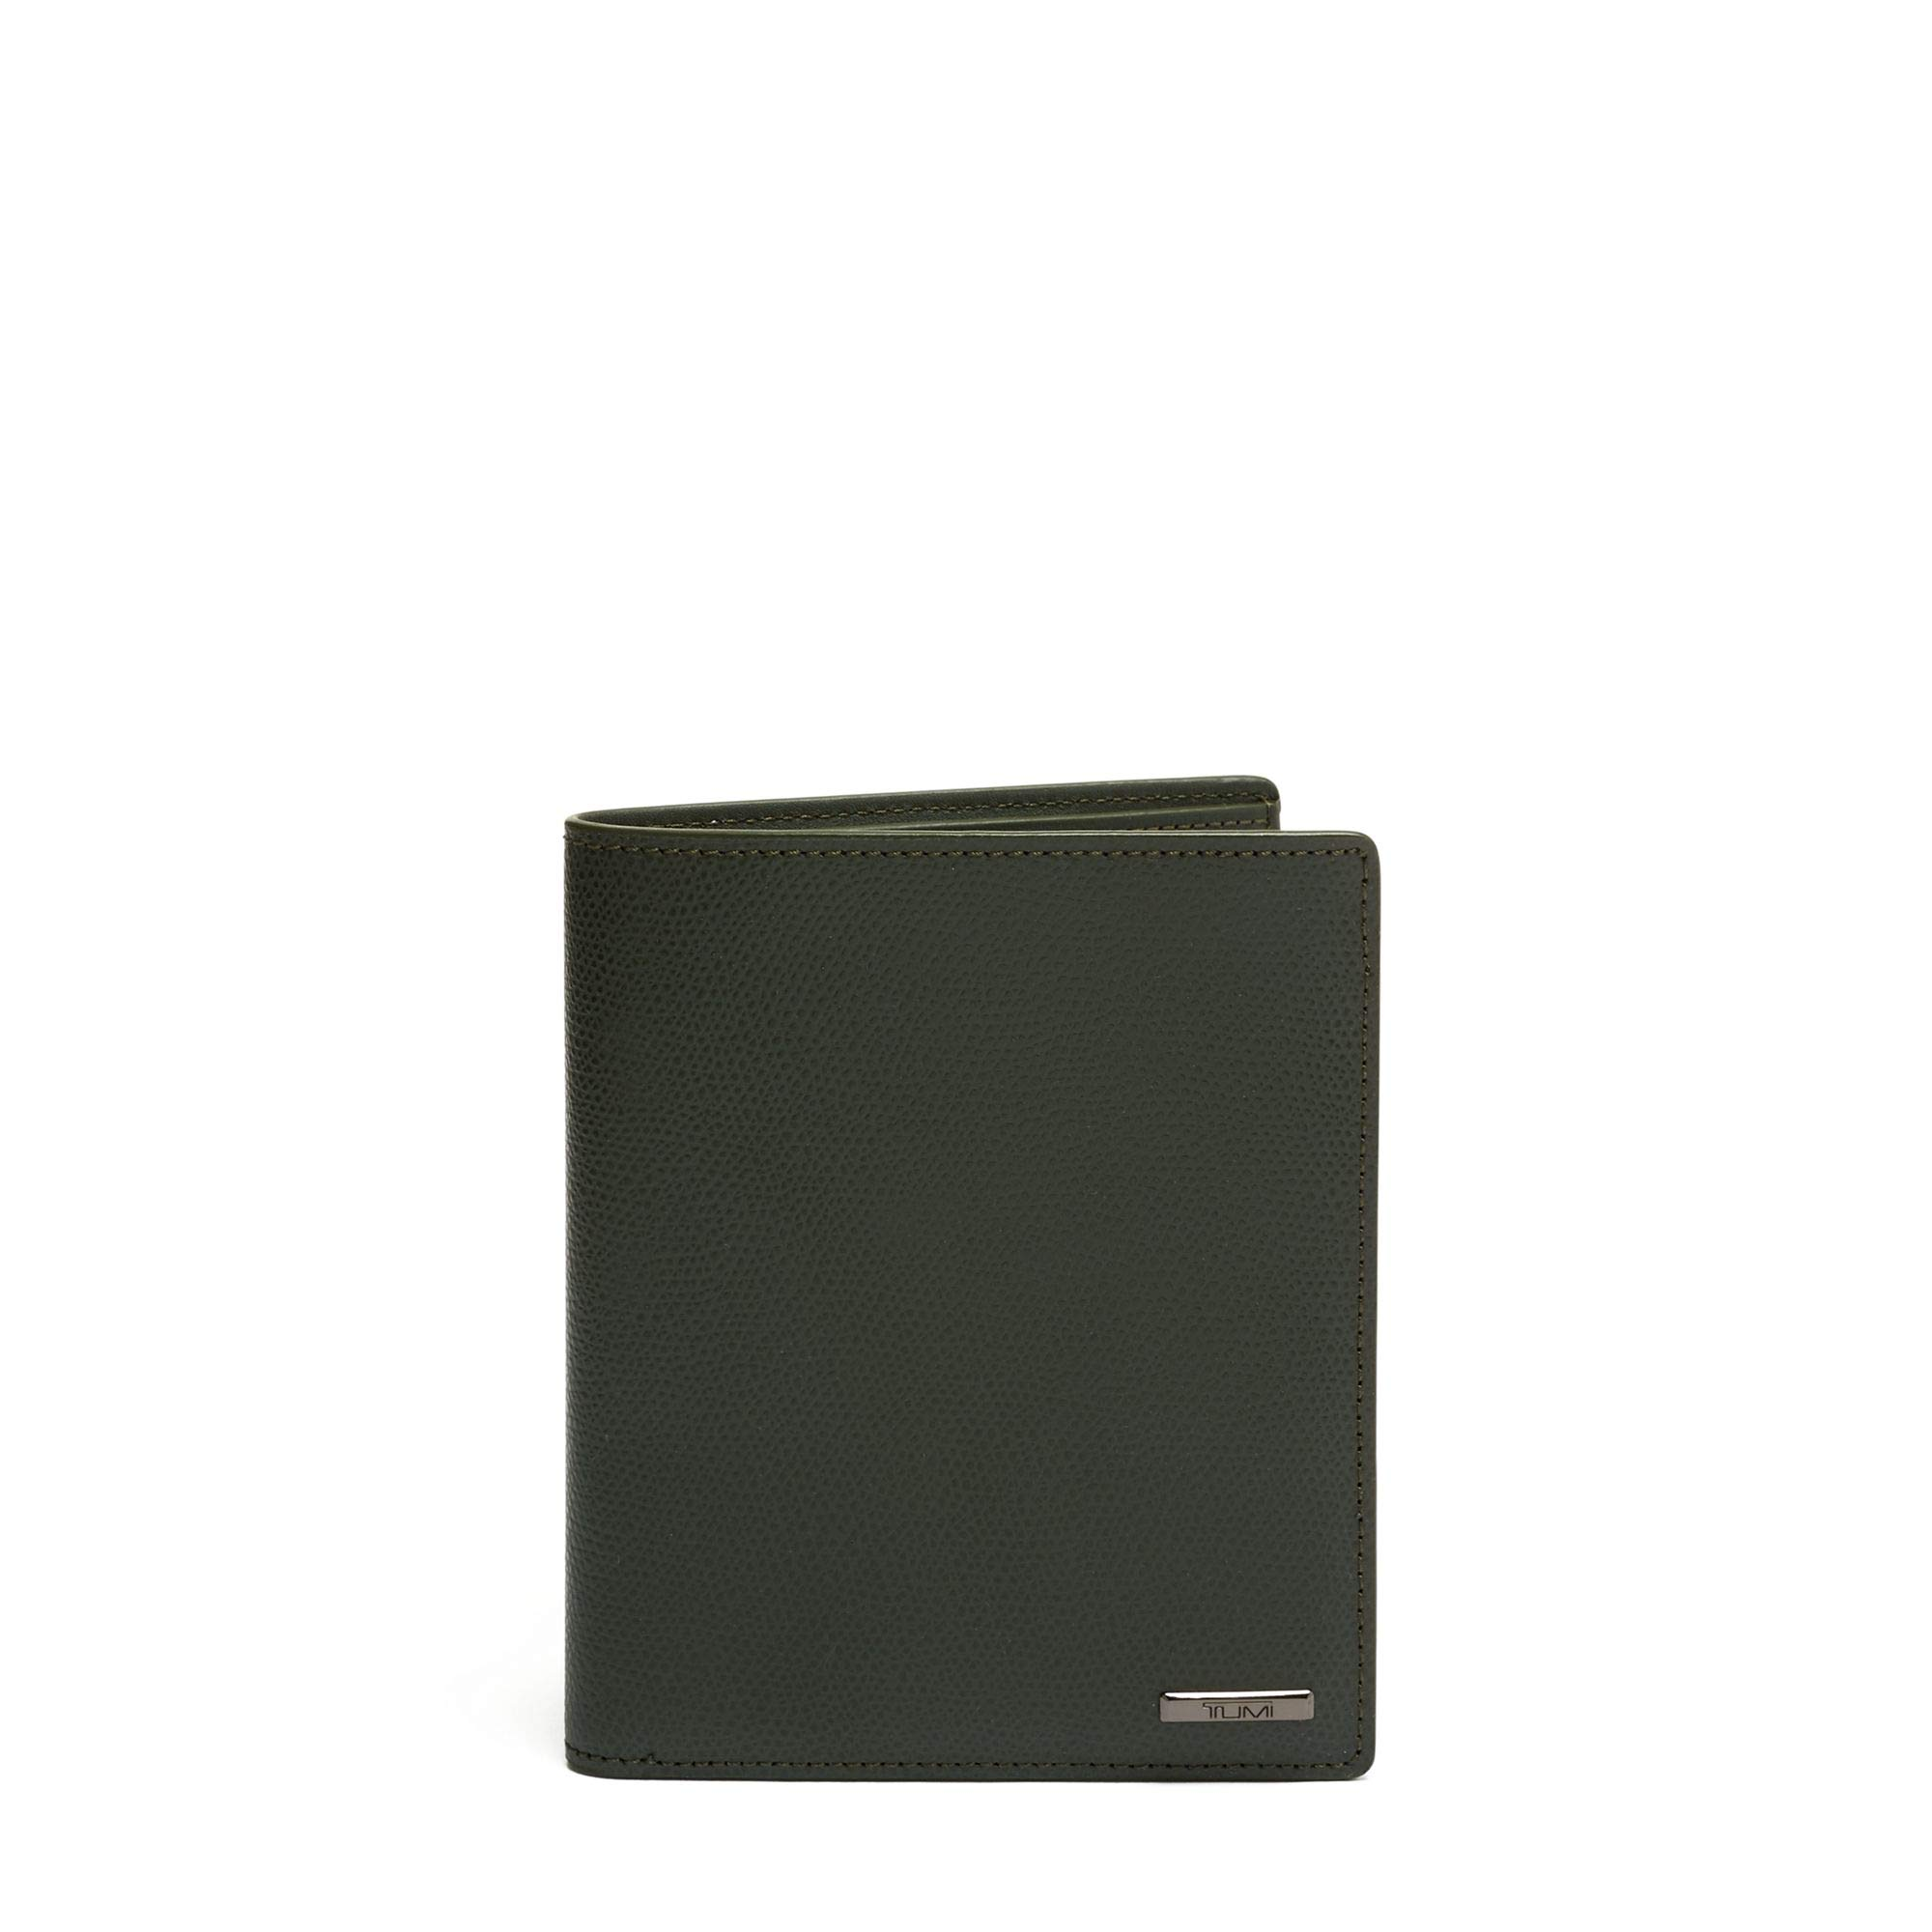 TUMI - Province Passport Case Holder - Wallet for Men and Women - Algae